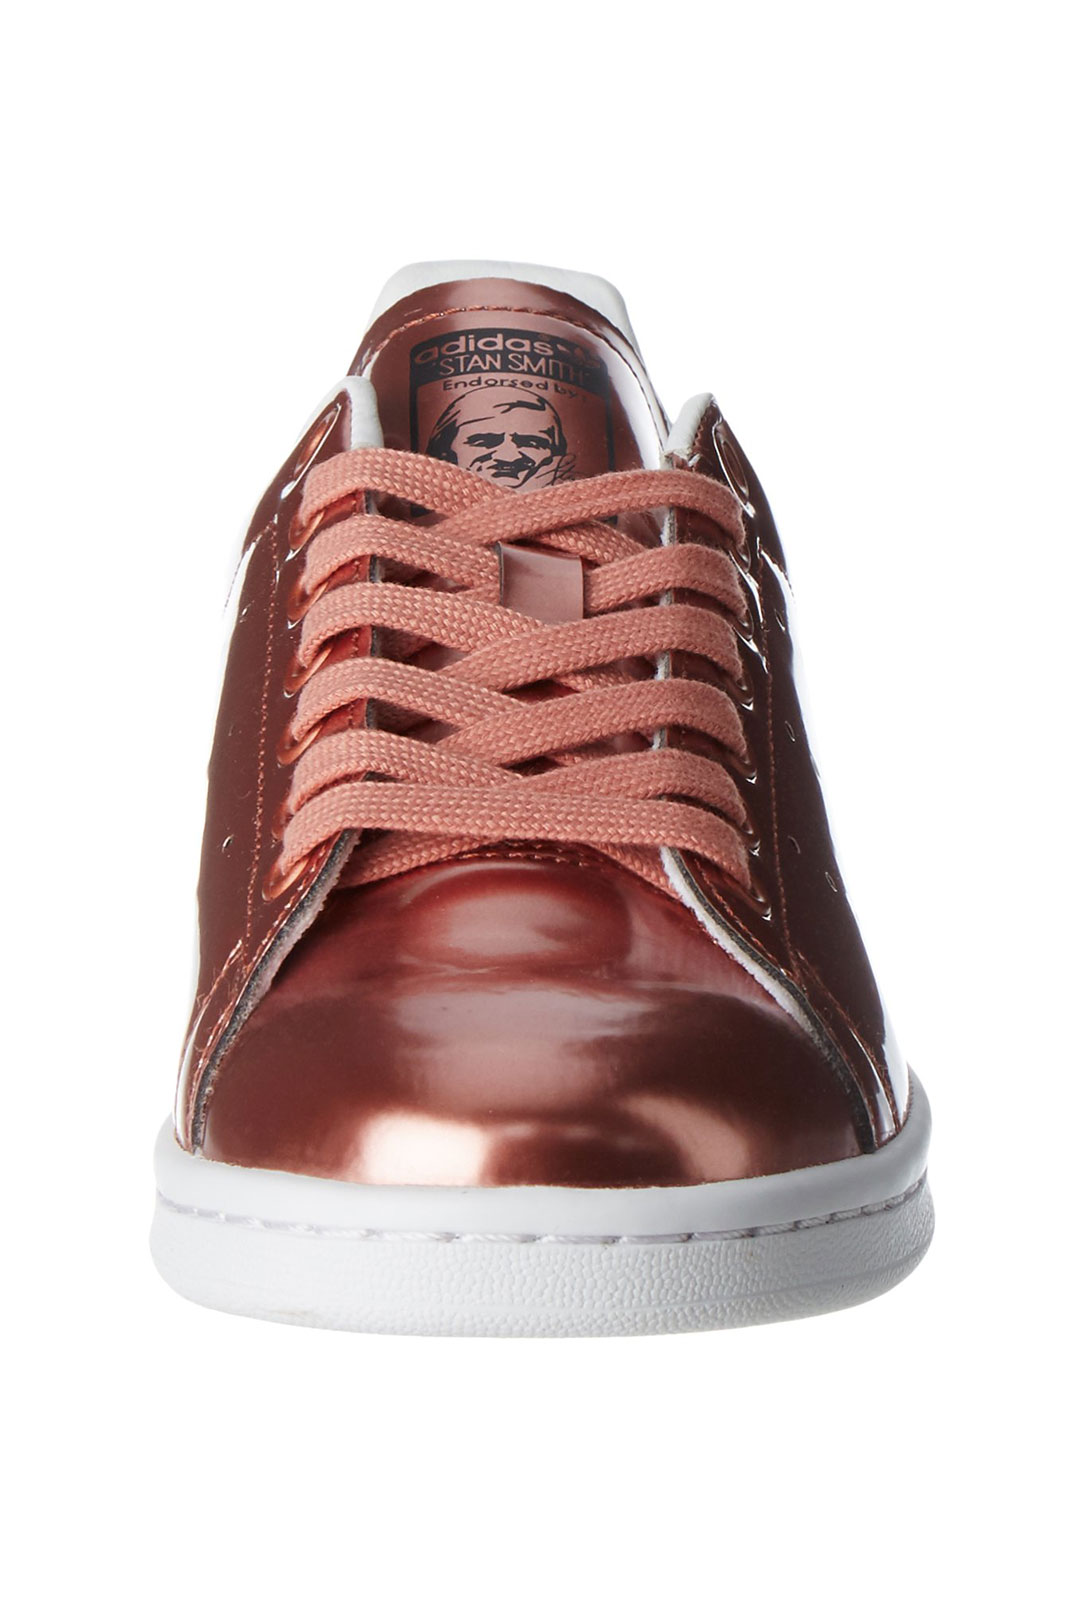 Baskets / Sneakers  Adidas CG3678 STAN SMITH W COPPER